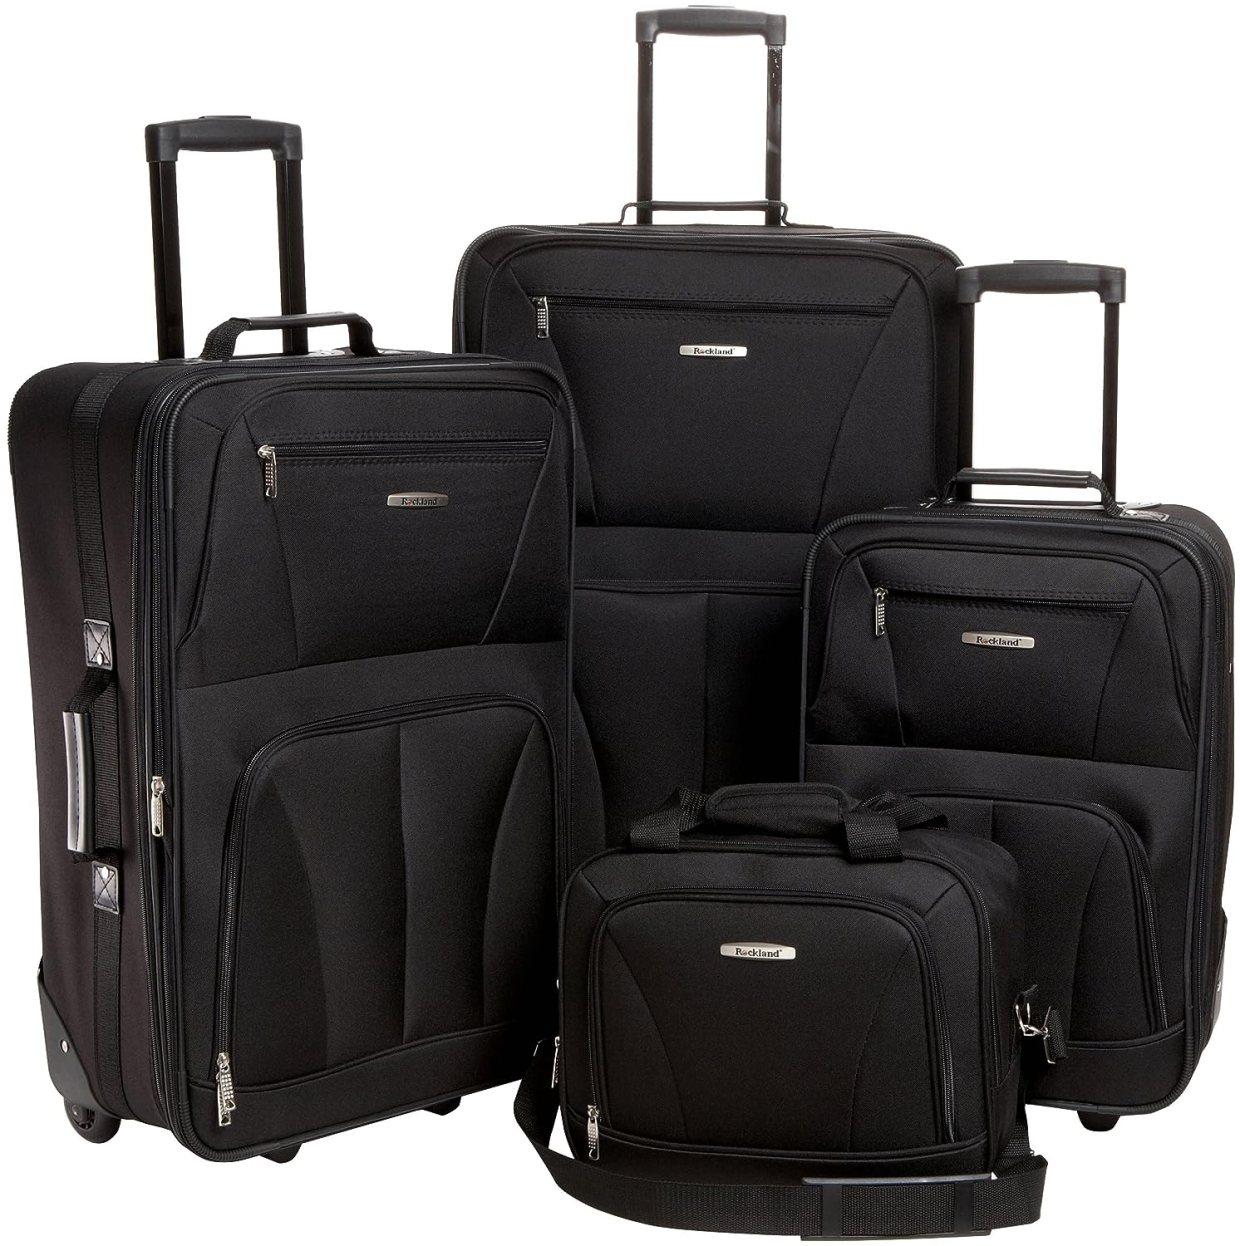 Juego de maletas para equipajehttps://amzn.to/2LbqvQ4